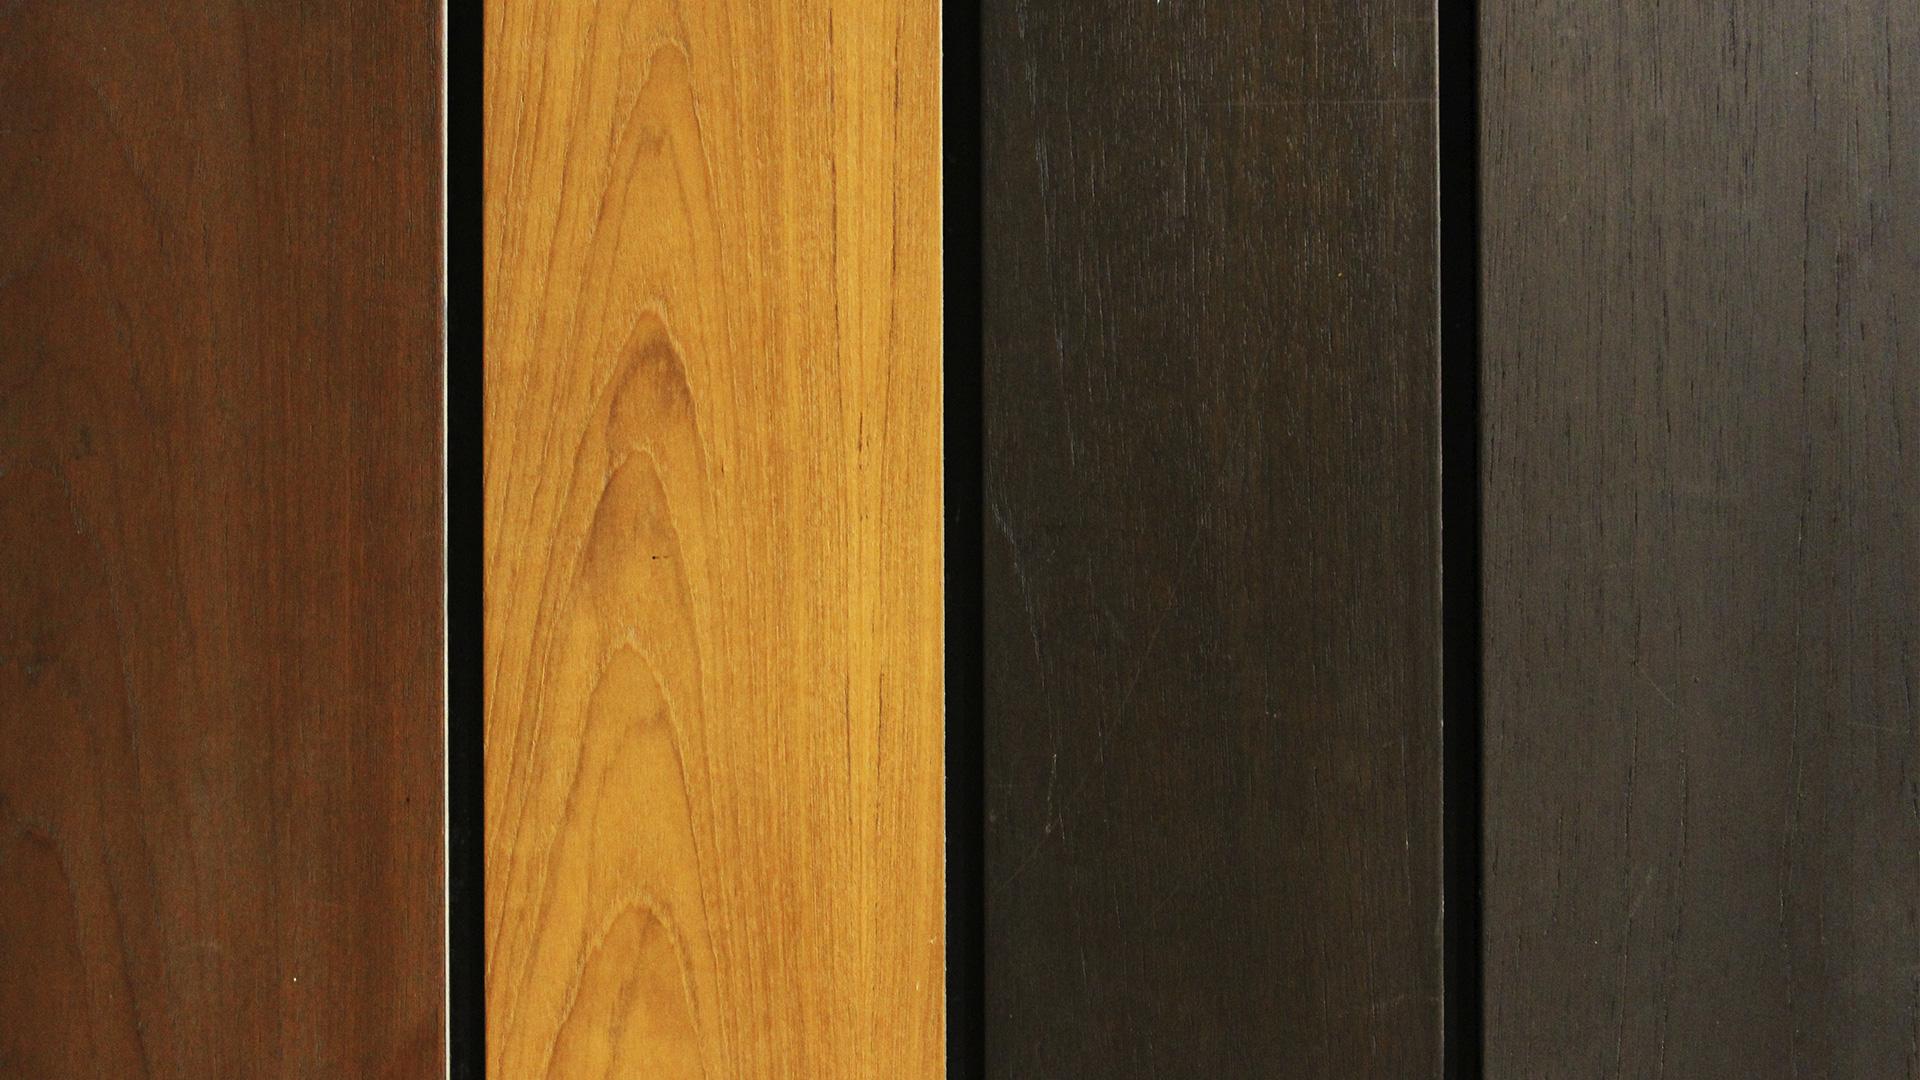 Hardwood Floor And Laminate Flooring